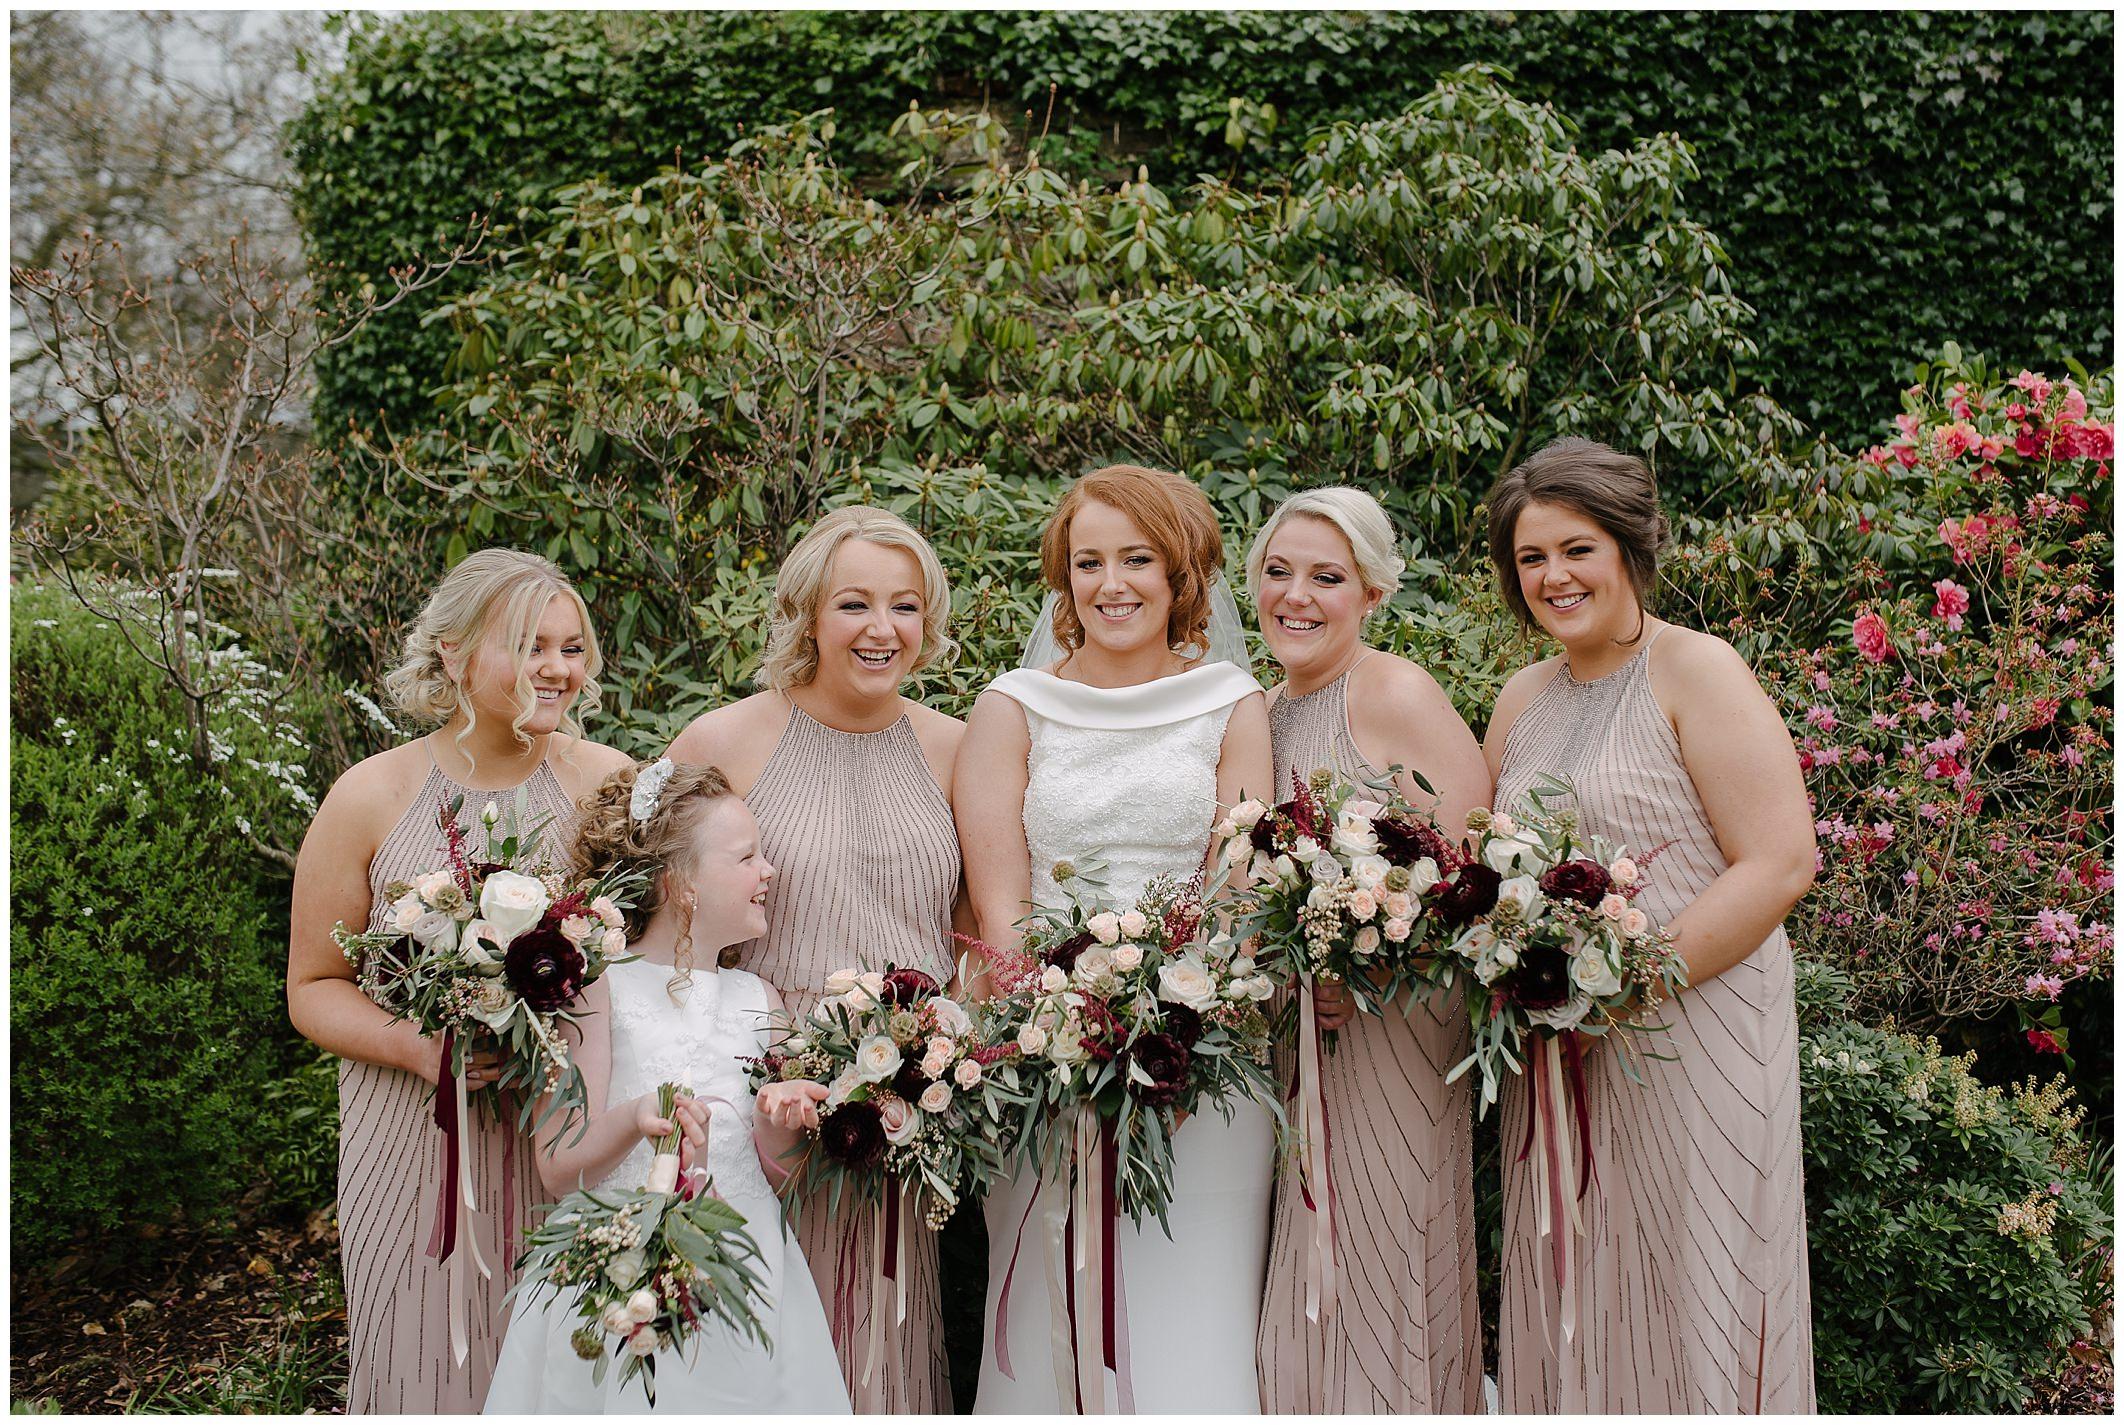 corick-house-wedding-hannah-gary-jude-browne-photography_0067.jpg